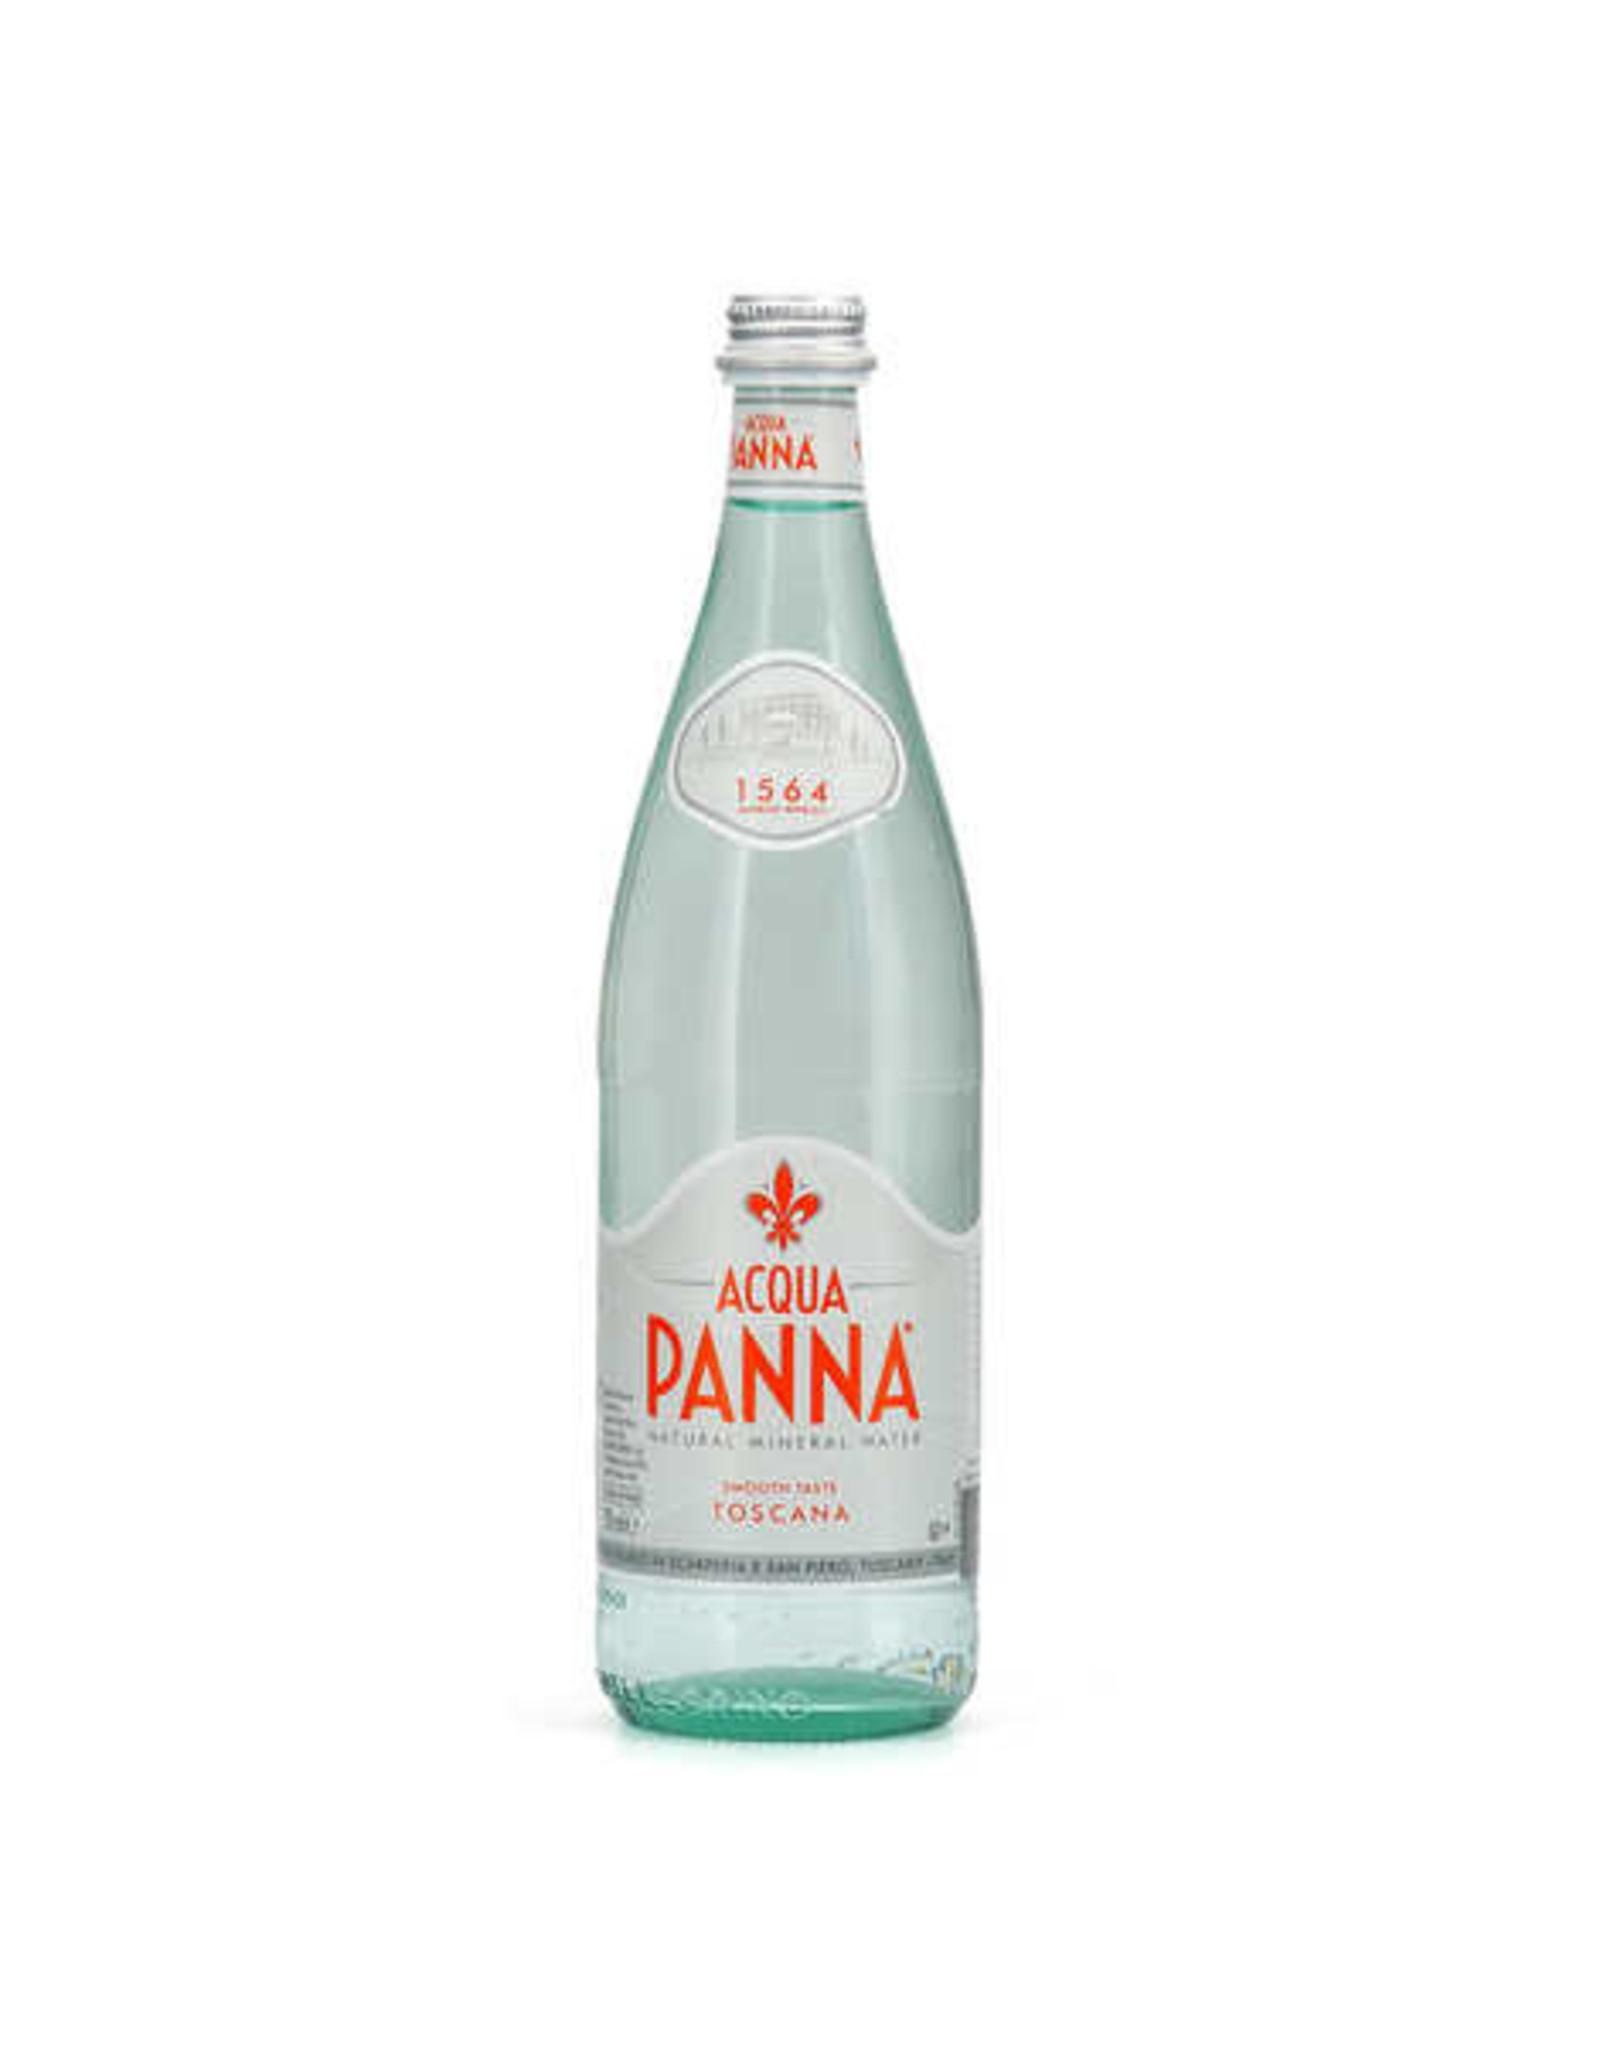 Acqua Panna Tuscan Bottled Water